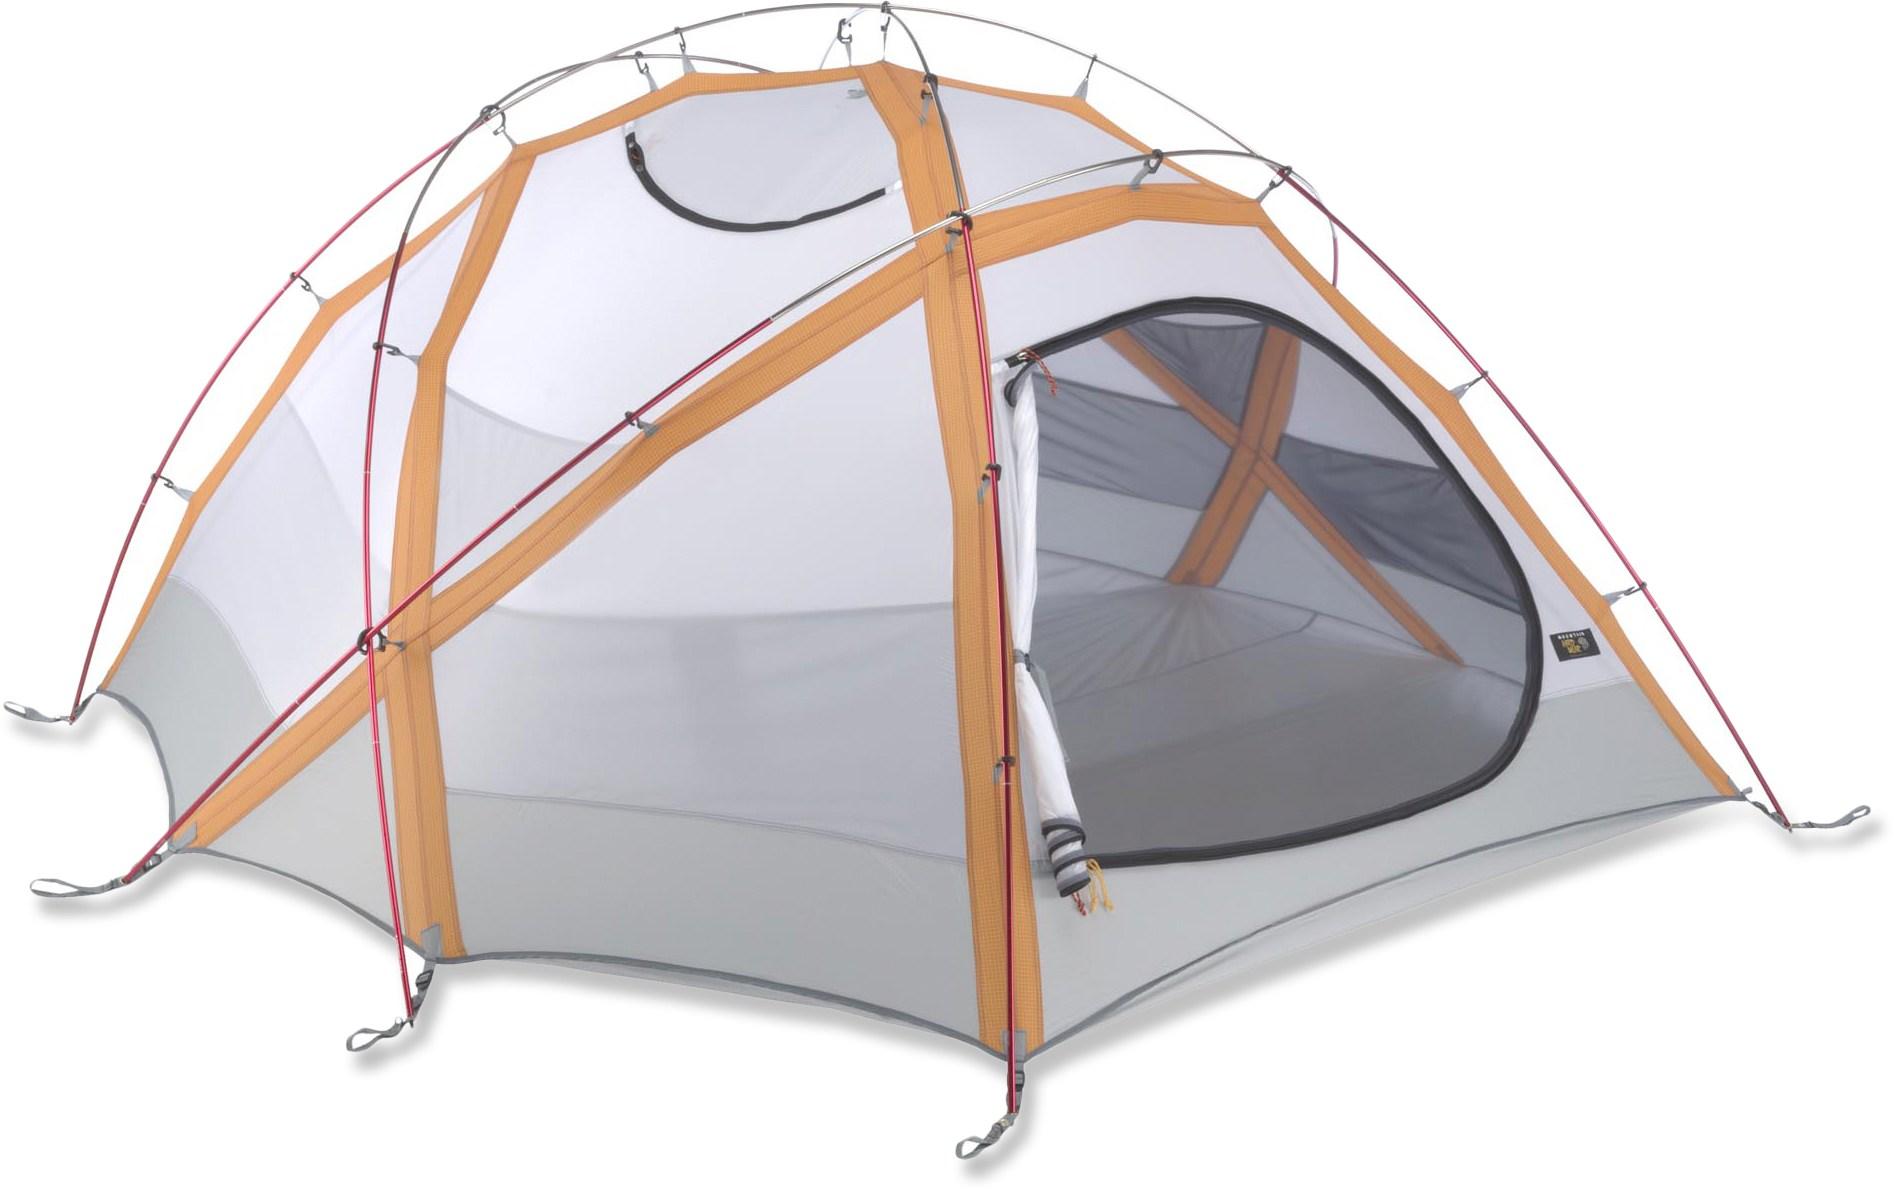 ... Equipment Tent design and development | trinity design collaborative